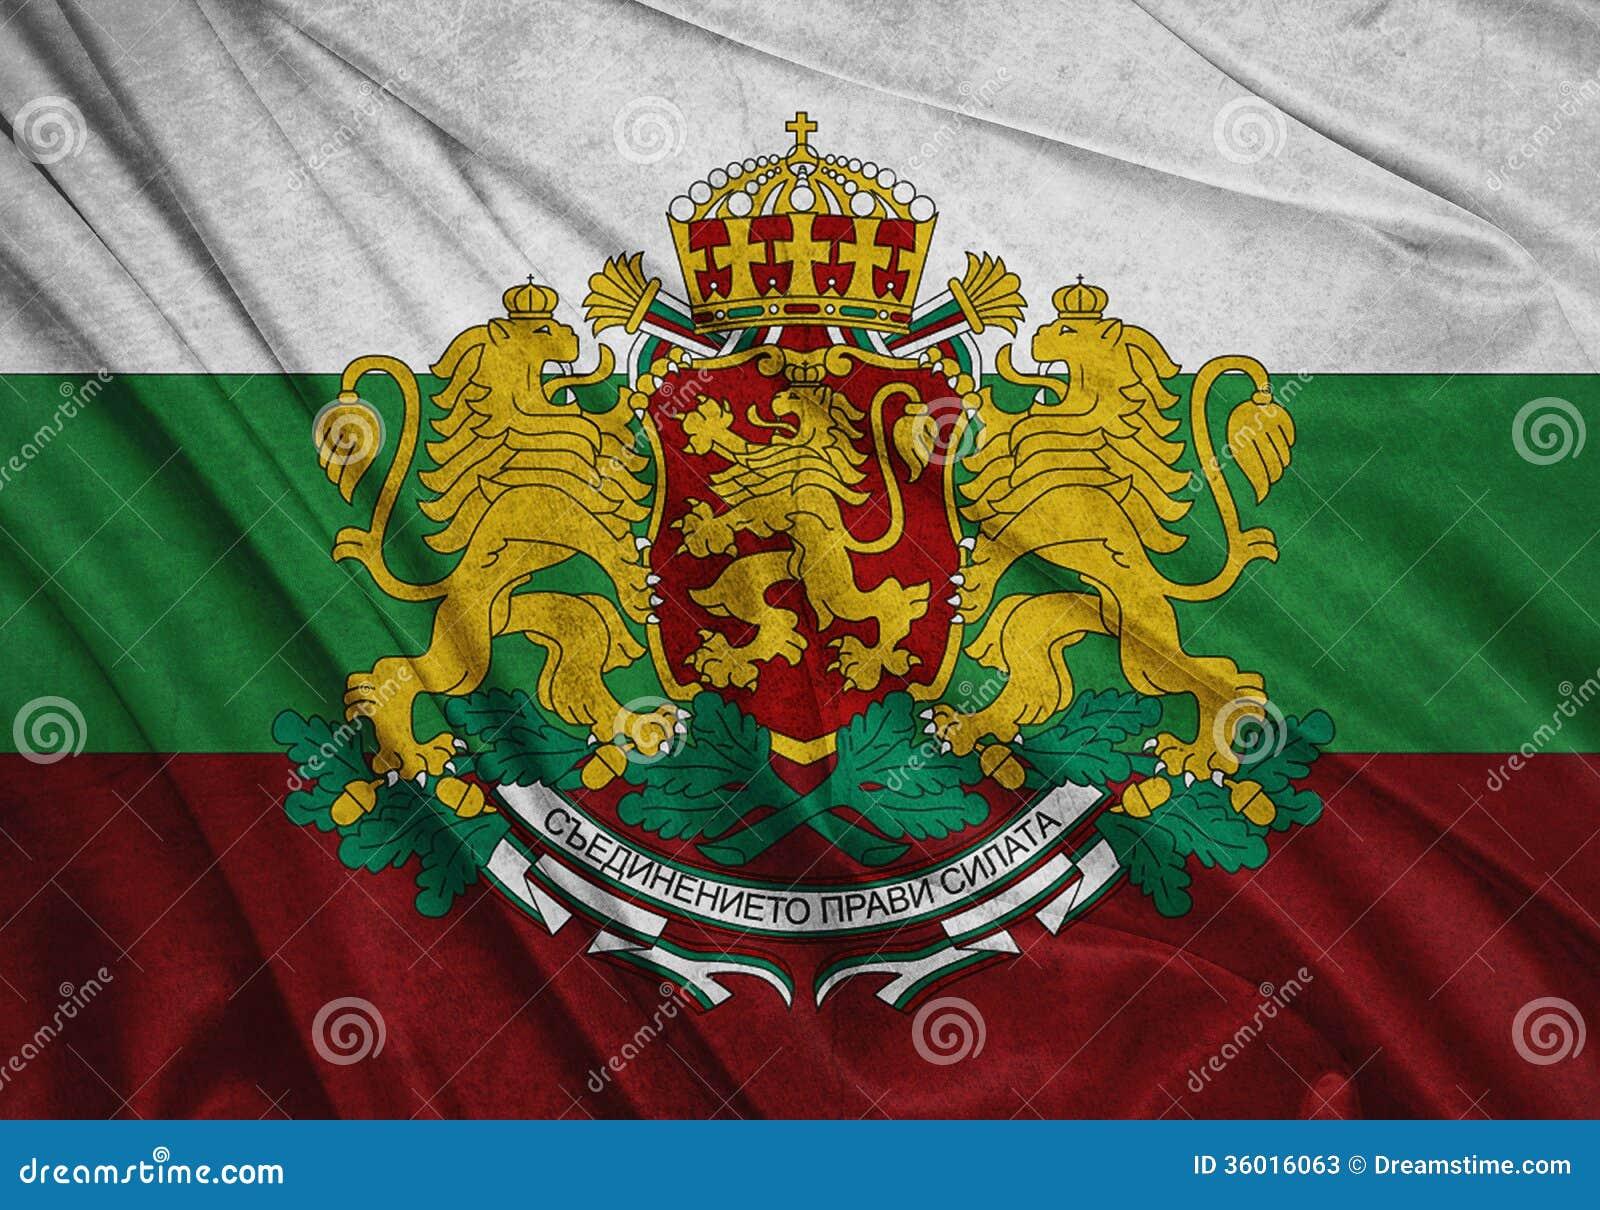 Flag Of Bulgaria Stock Photos - Image: 36016063Western Desert Clipart